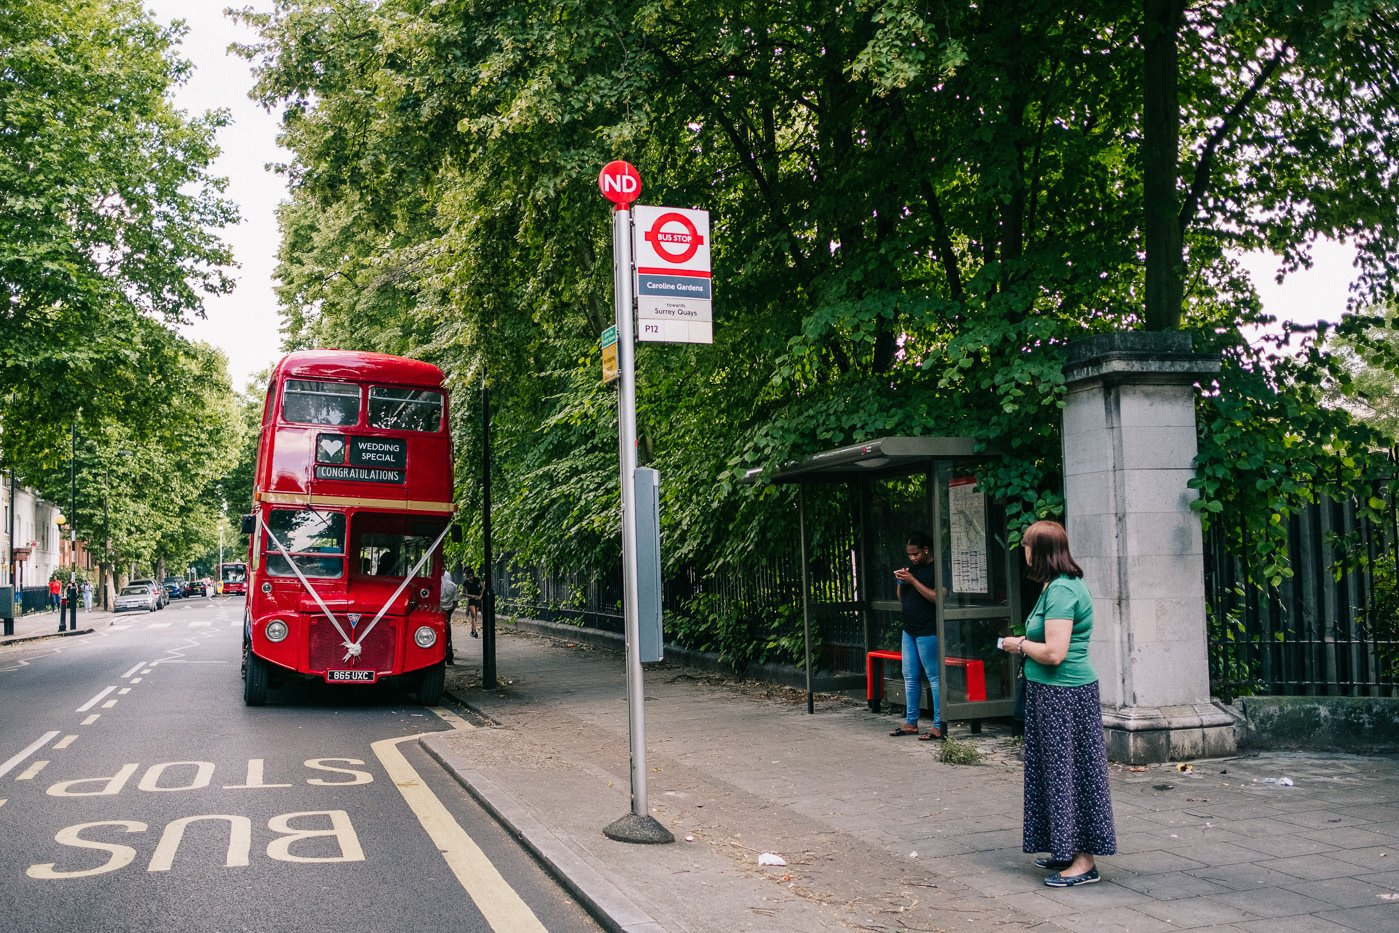 Reportage brockwell lido wedding photos london bus